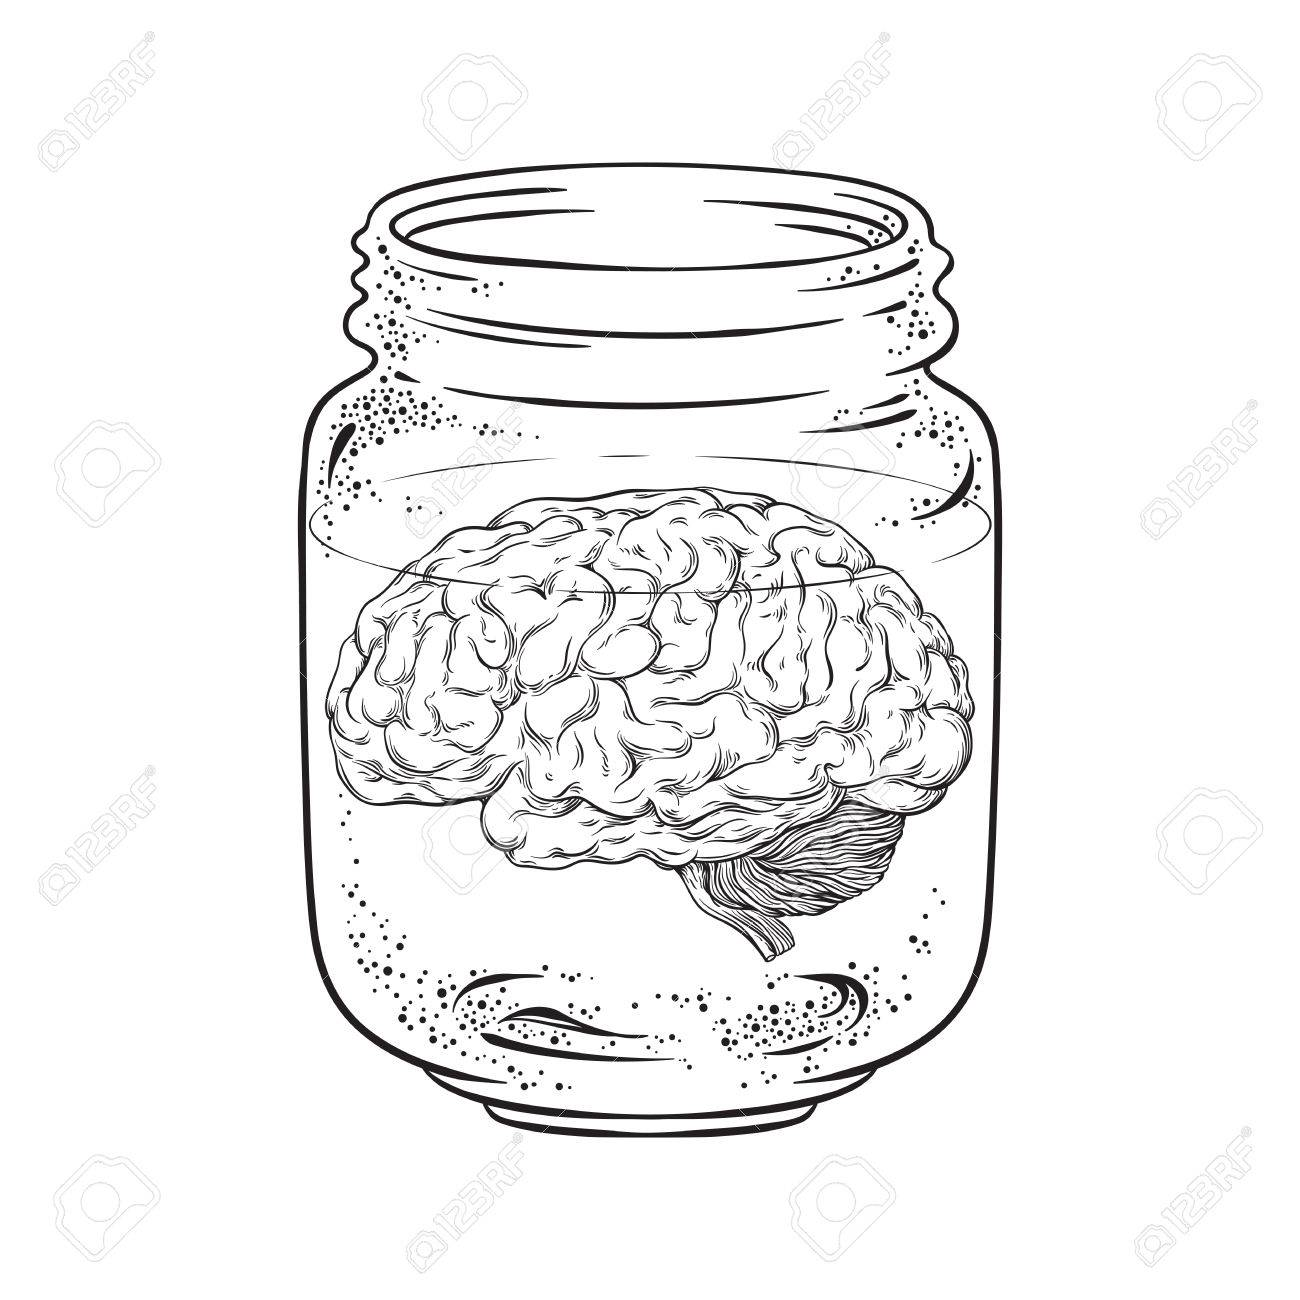 1300x1300 Human Brain In Glass Jar Isolated. Sticker, Print Or Blackwork